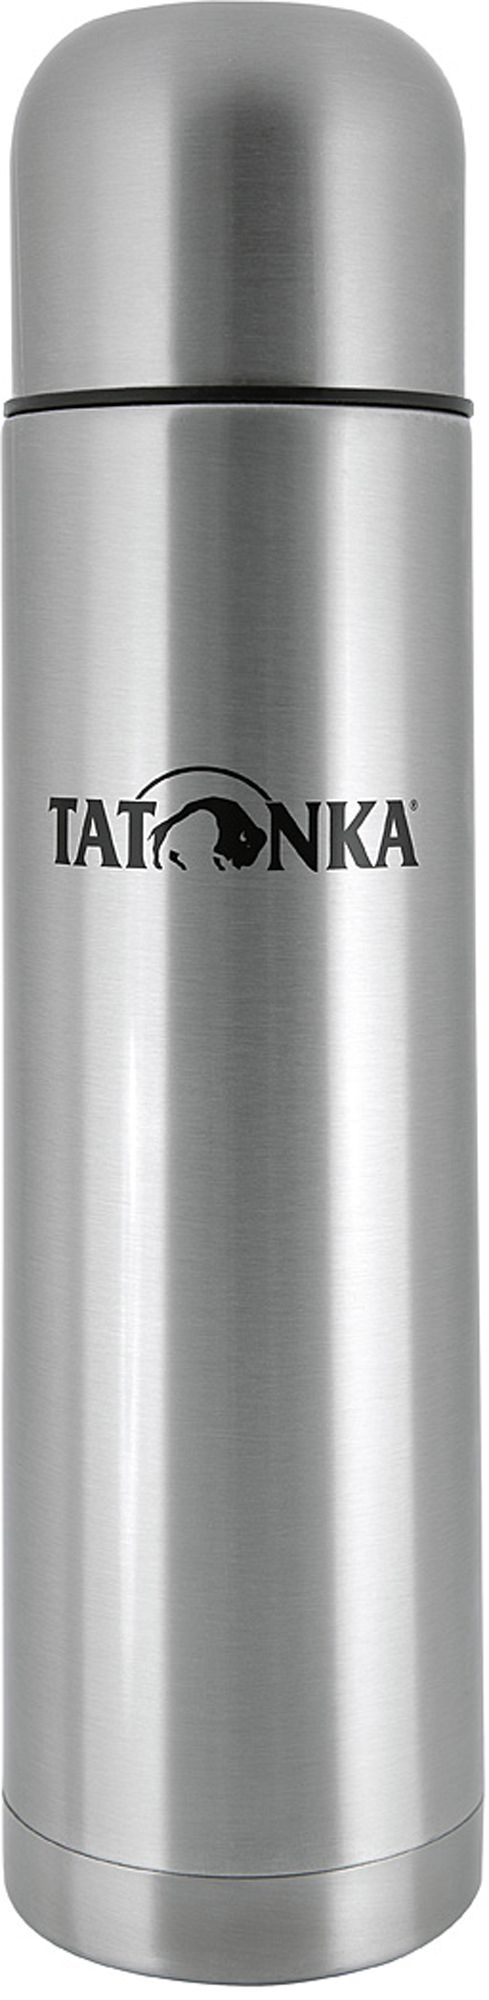 Tatonka Термос Tatonka 0,7 л цена 2017